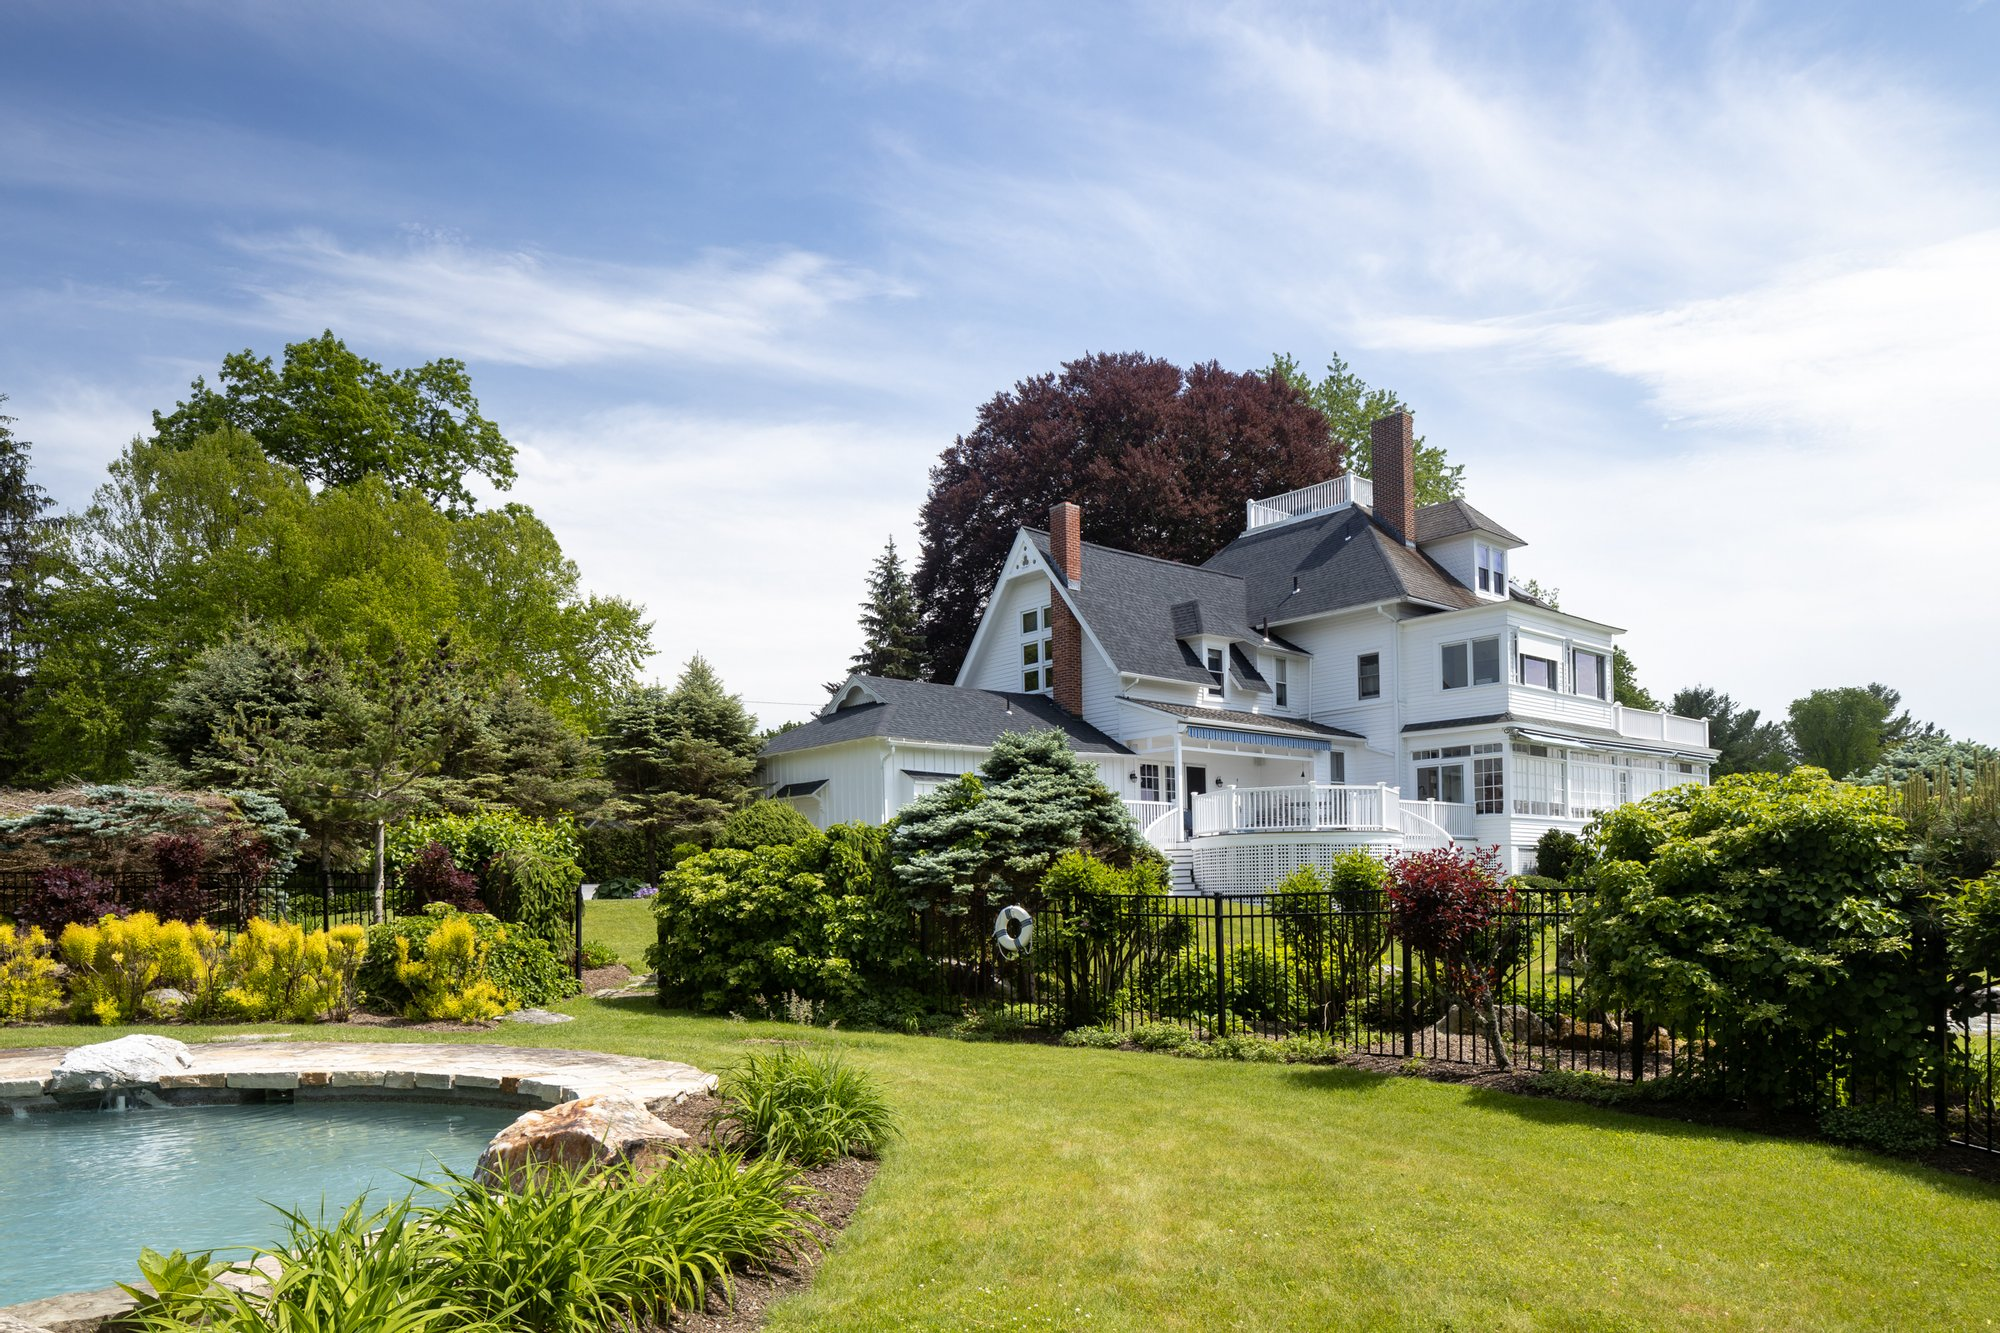 House in West Stockbridge, Massachusetts, United States 1